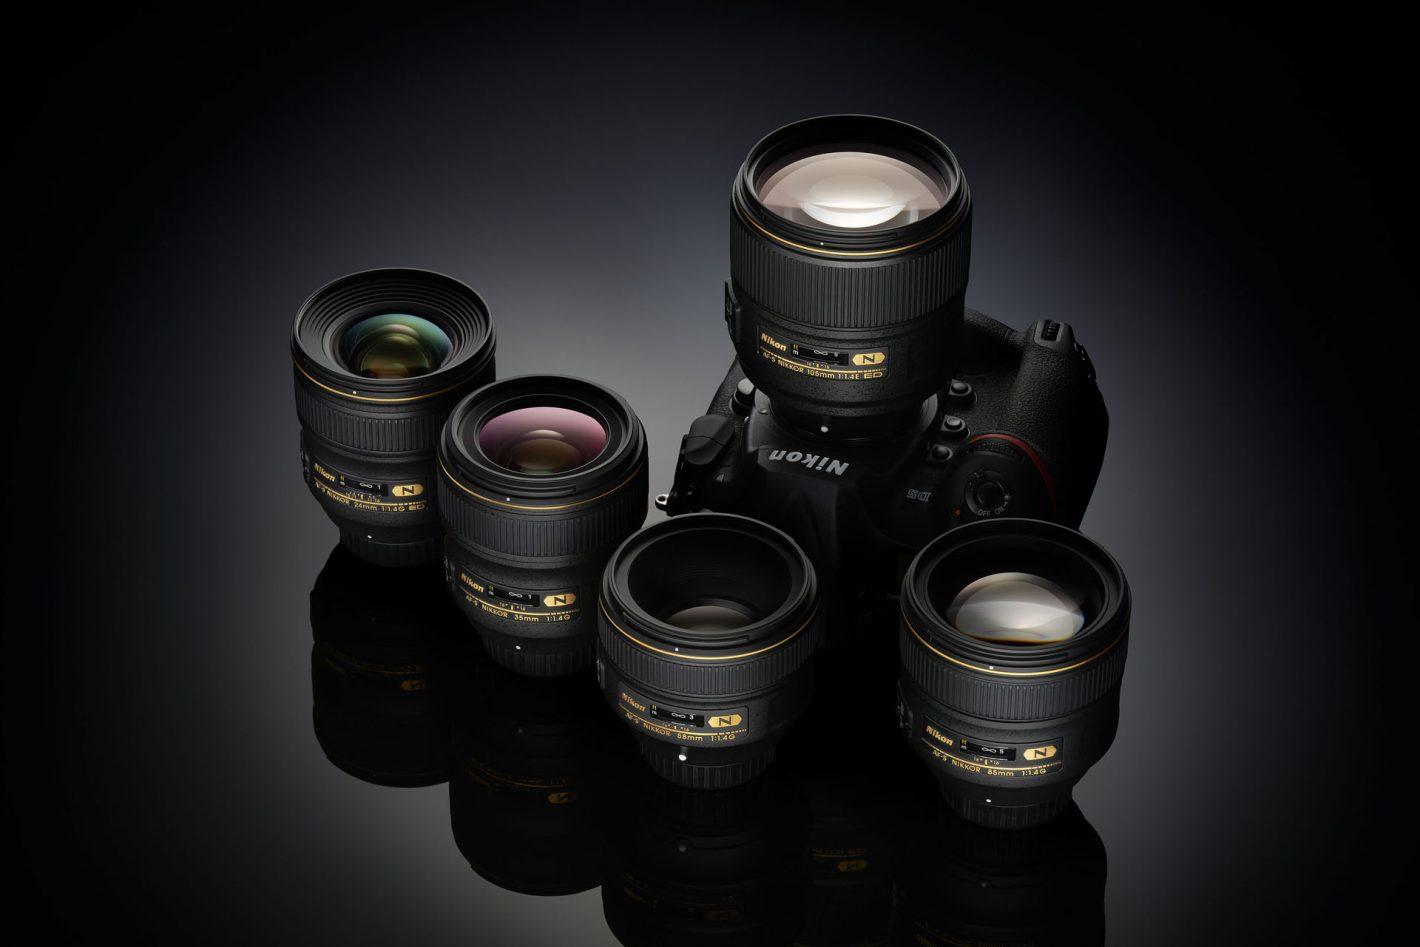 Nano Crystal Nikon Nikkor 105 mm